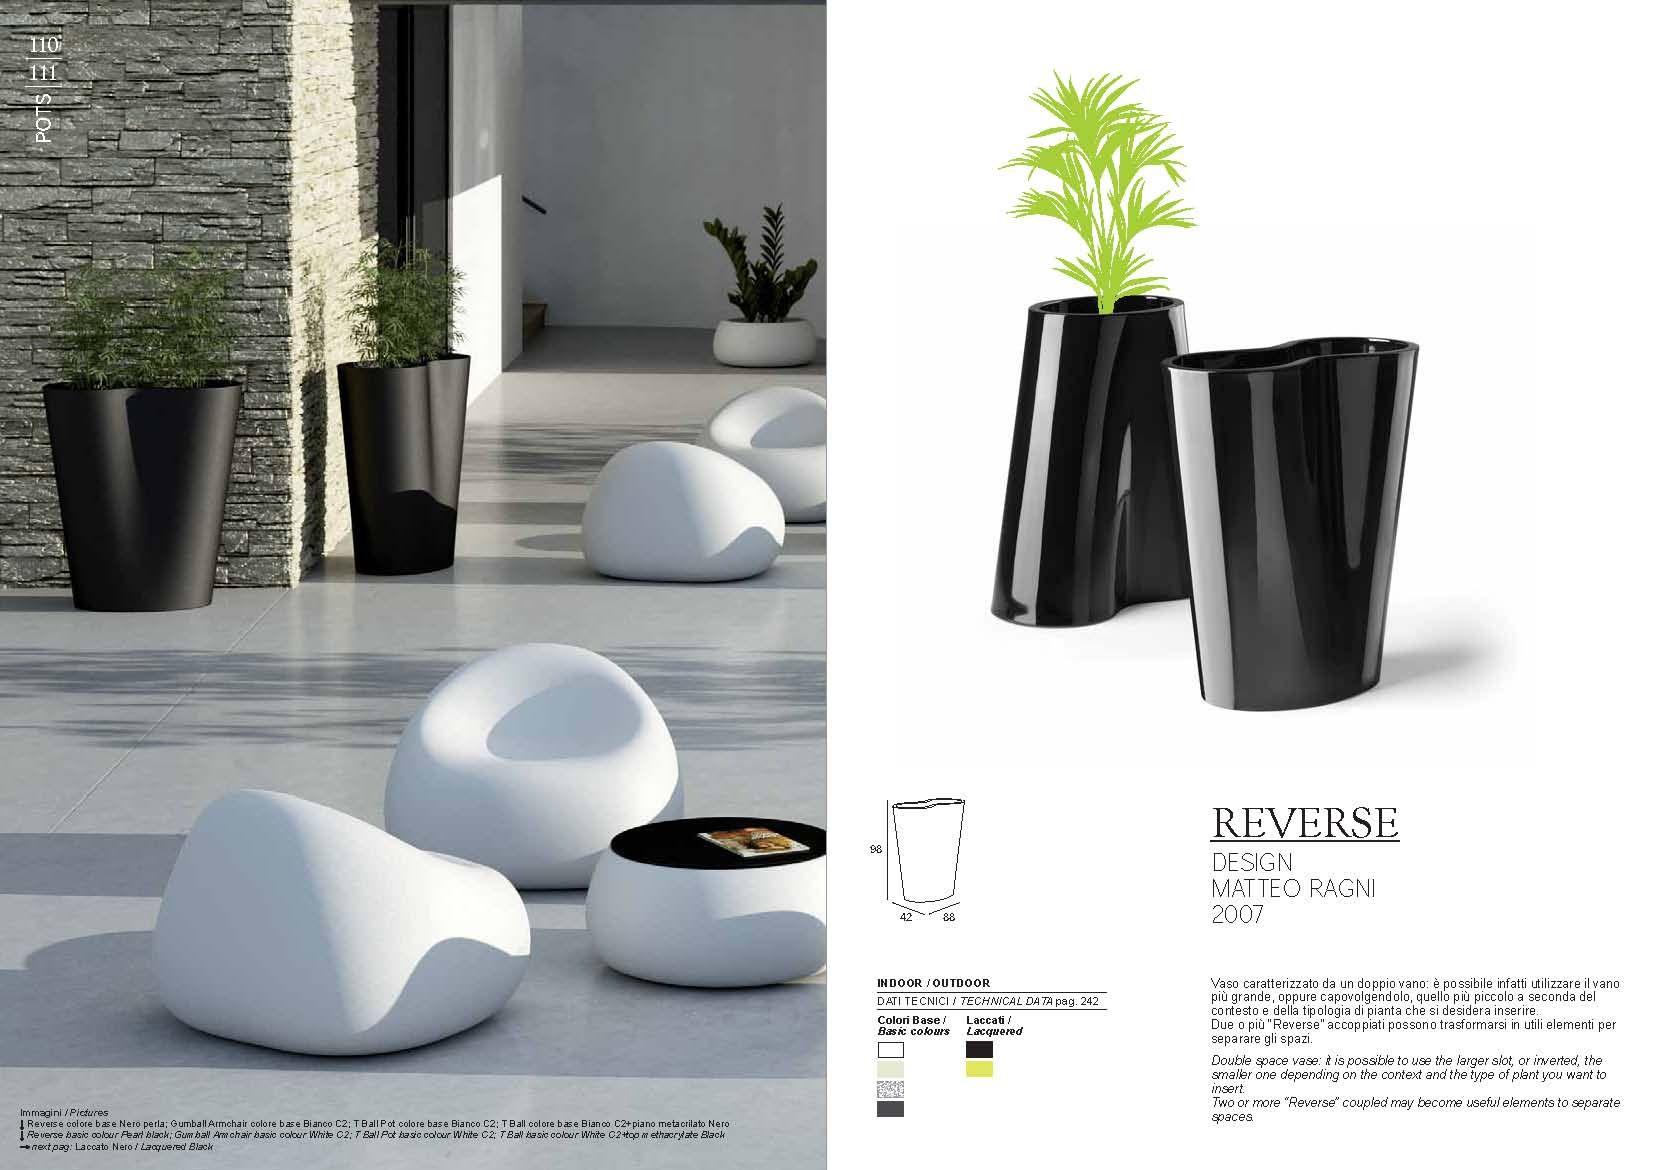 gartenm bel blumentopf serie plust collection r ckw rtsgangdie m bel aus italien. Black Bedroom Furniture Sets. Home Design Ideas